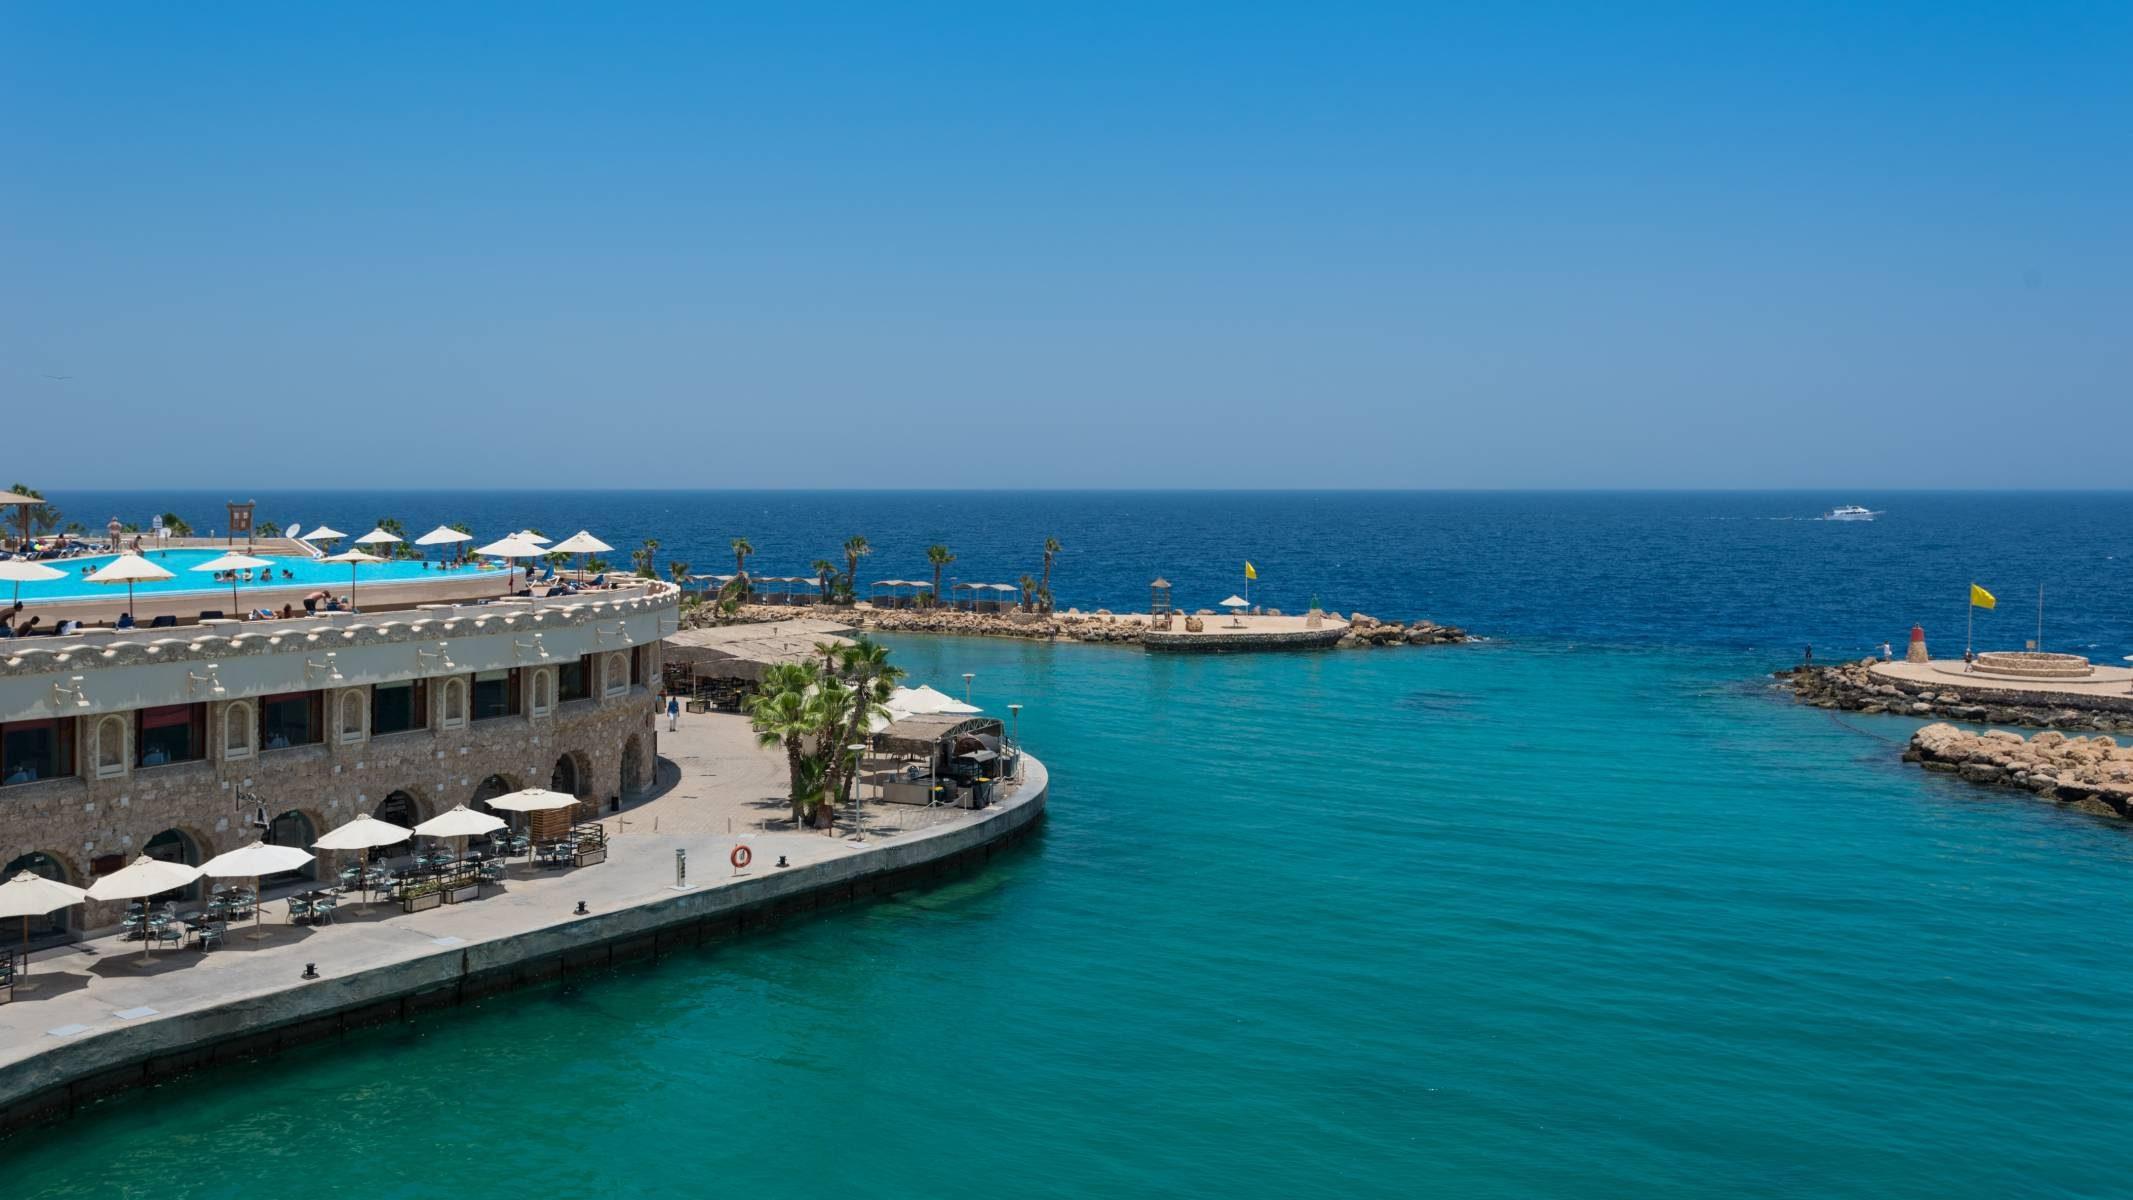 Sol Y Mar Paradise Beach Resort (Mısır Safaga) otel fotoğrafı ve videoları